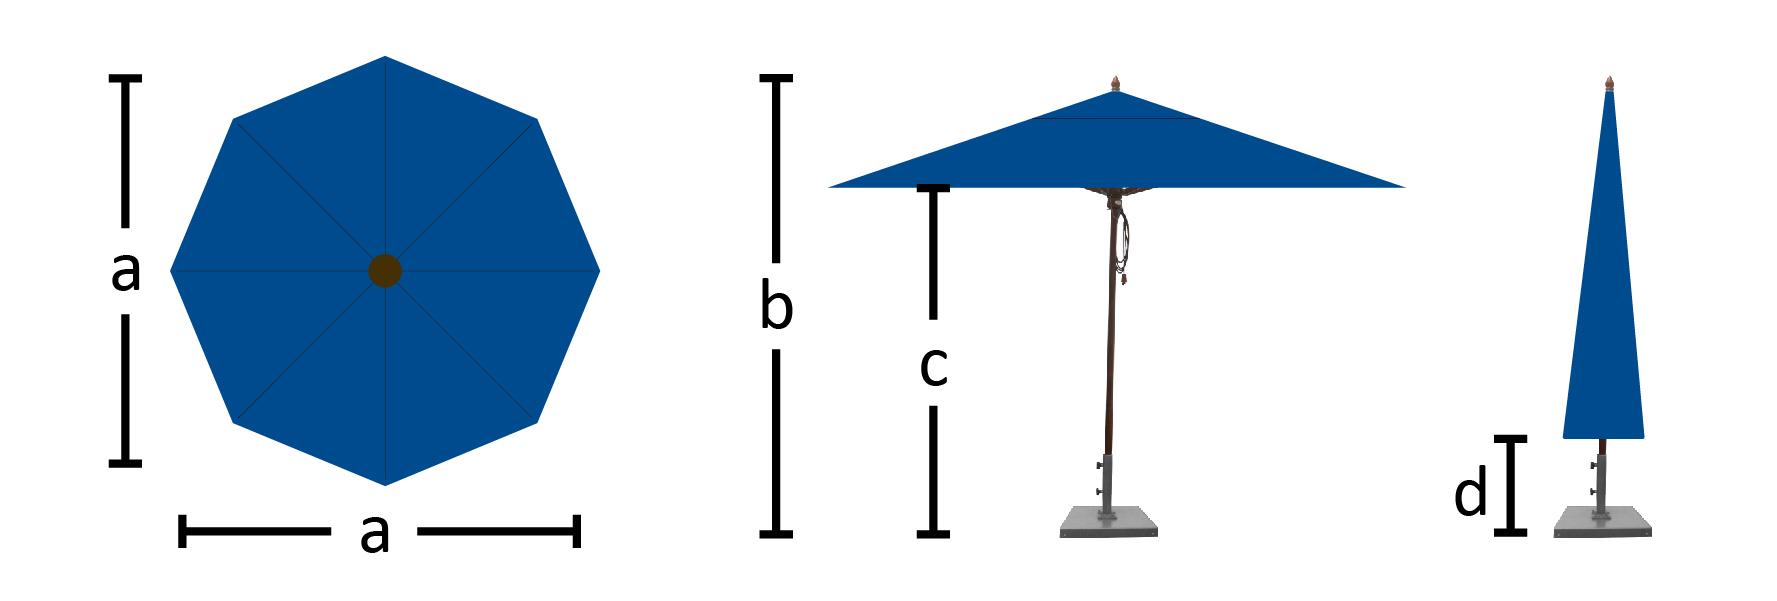 Octagon Dimensions